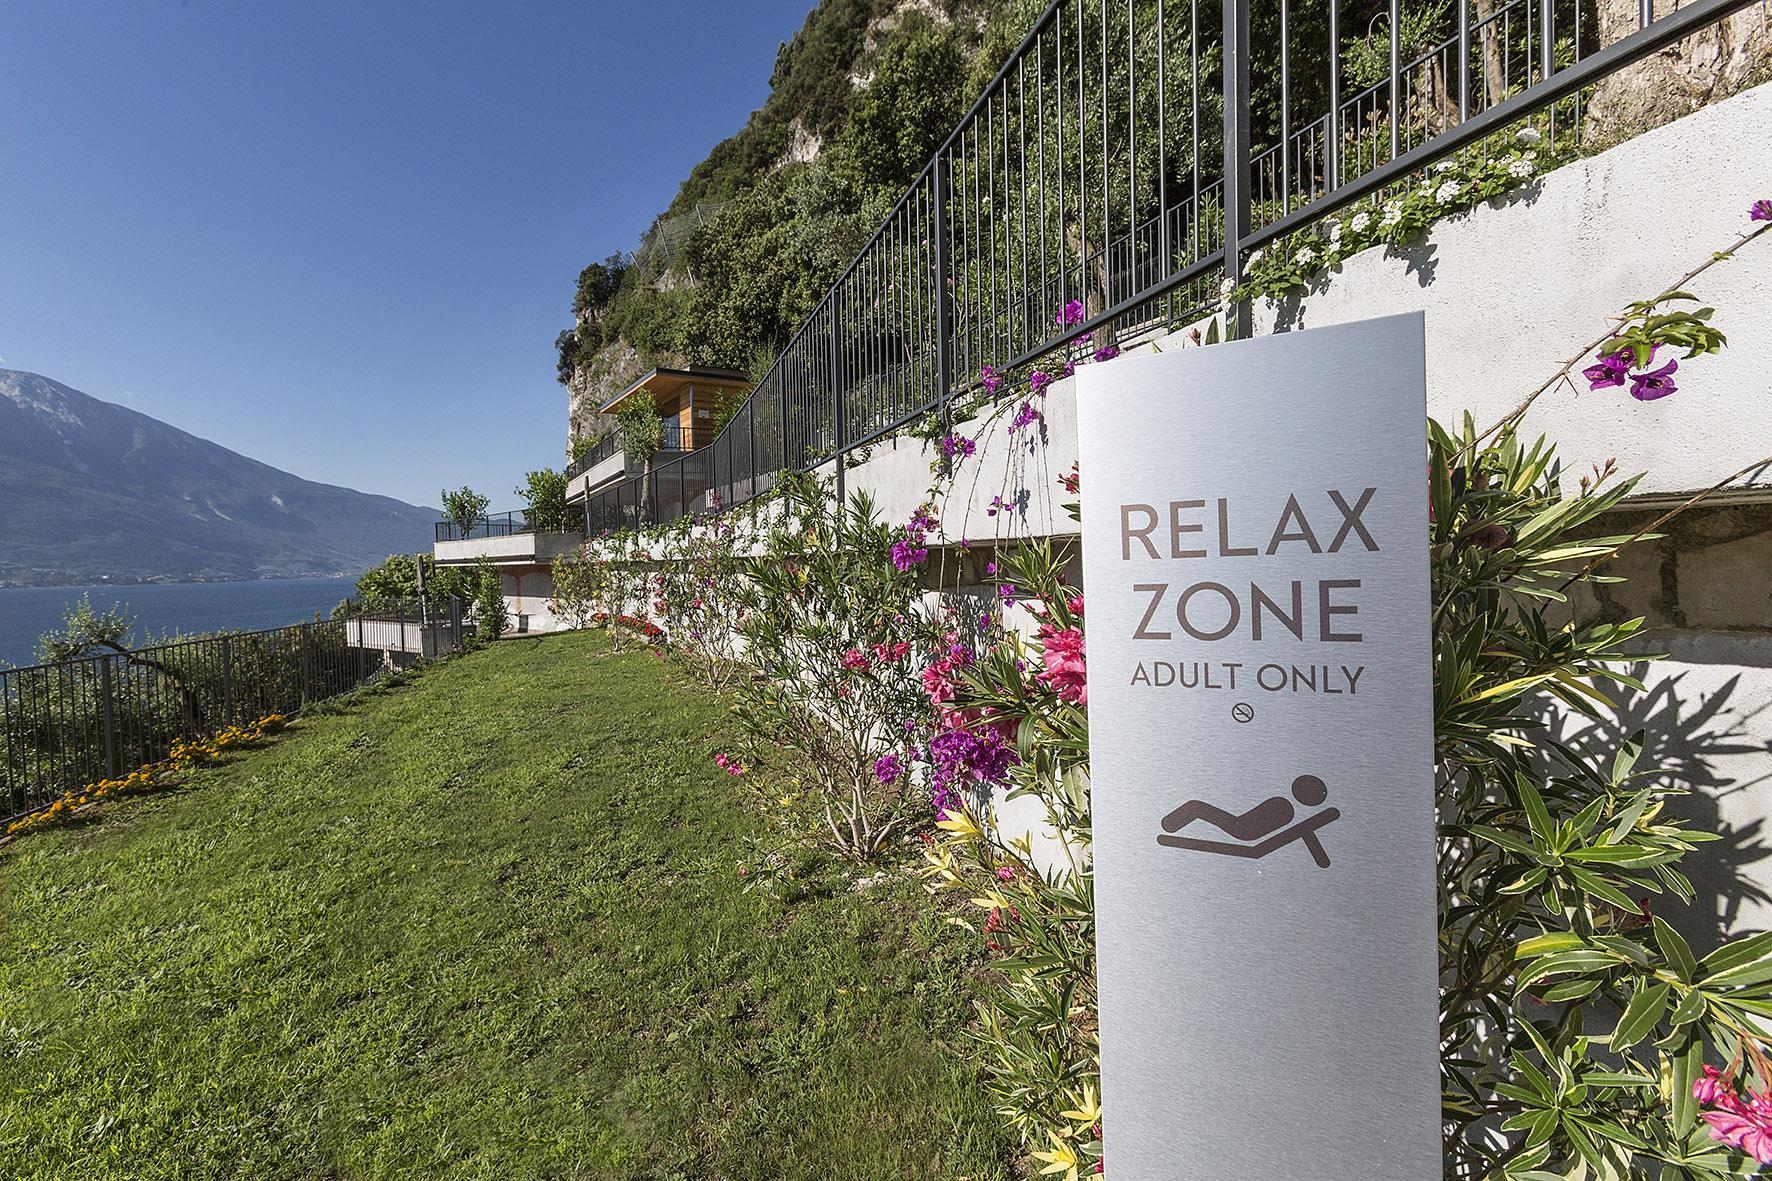 limone_sul_garda_hotel_atilius_zona_relax 501.jpg